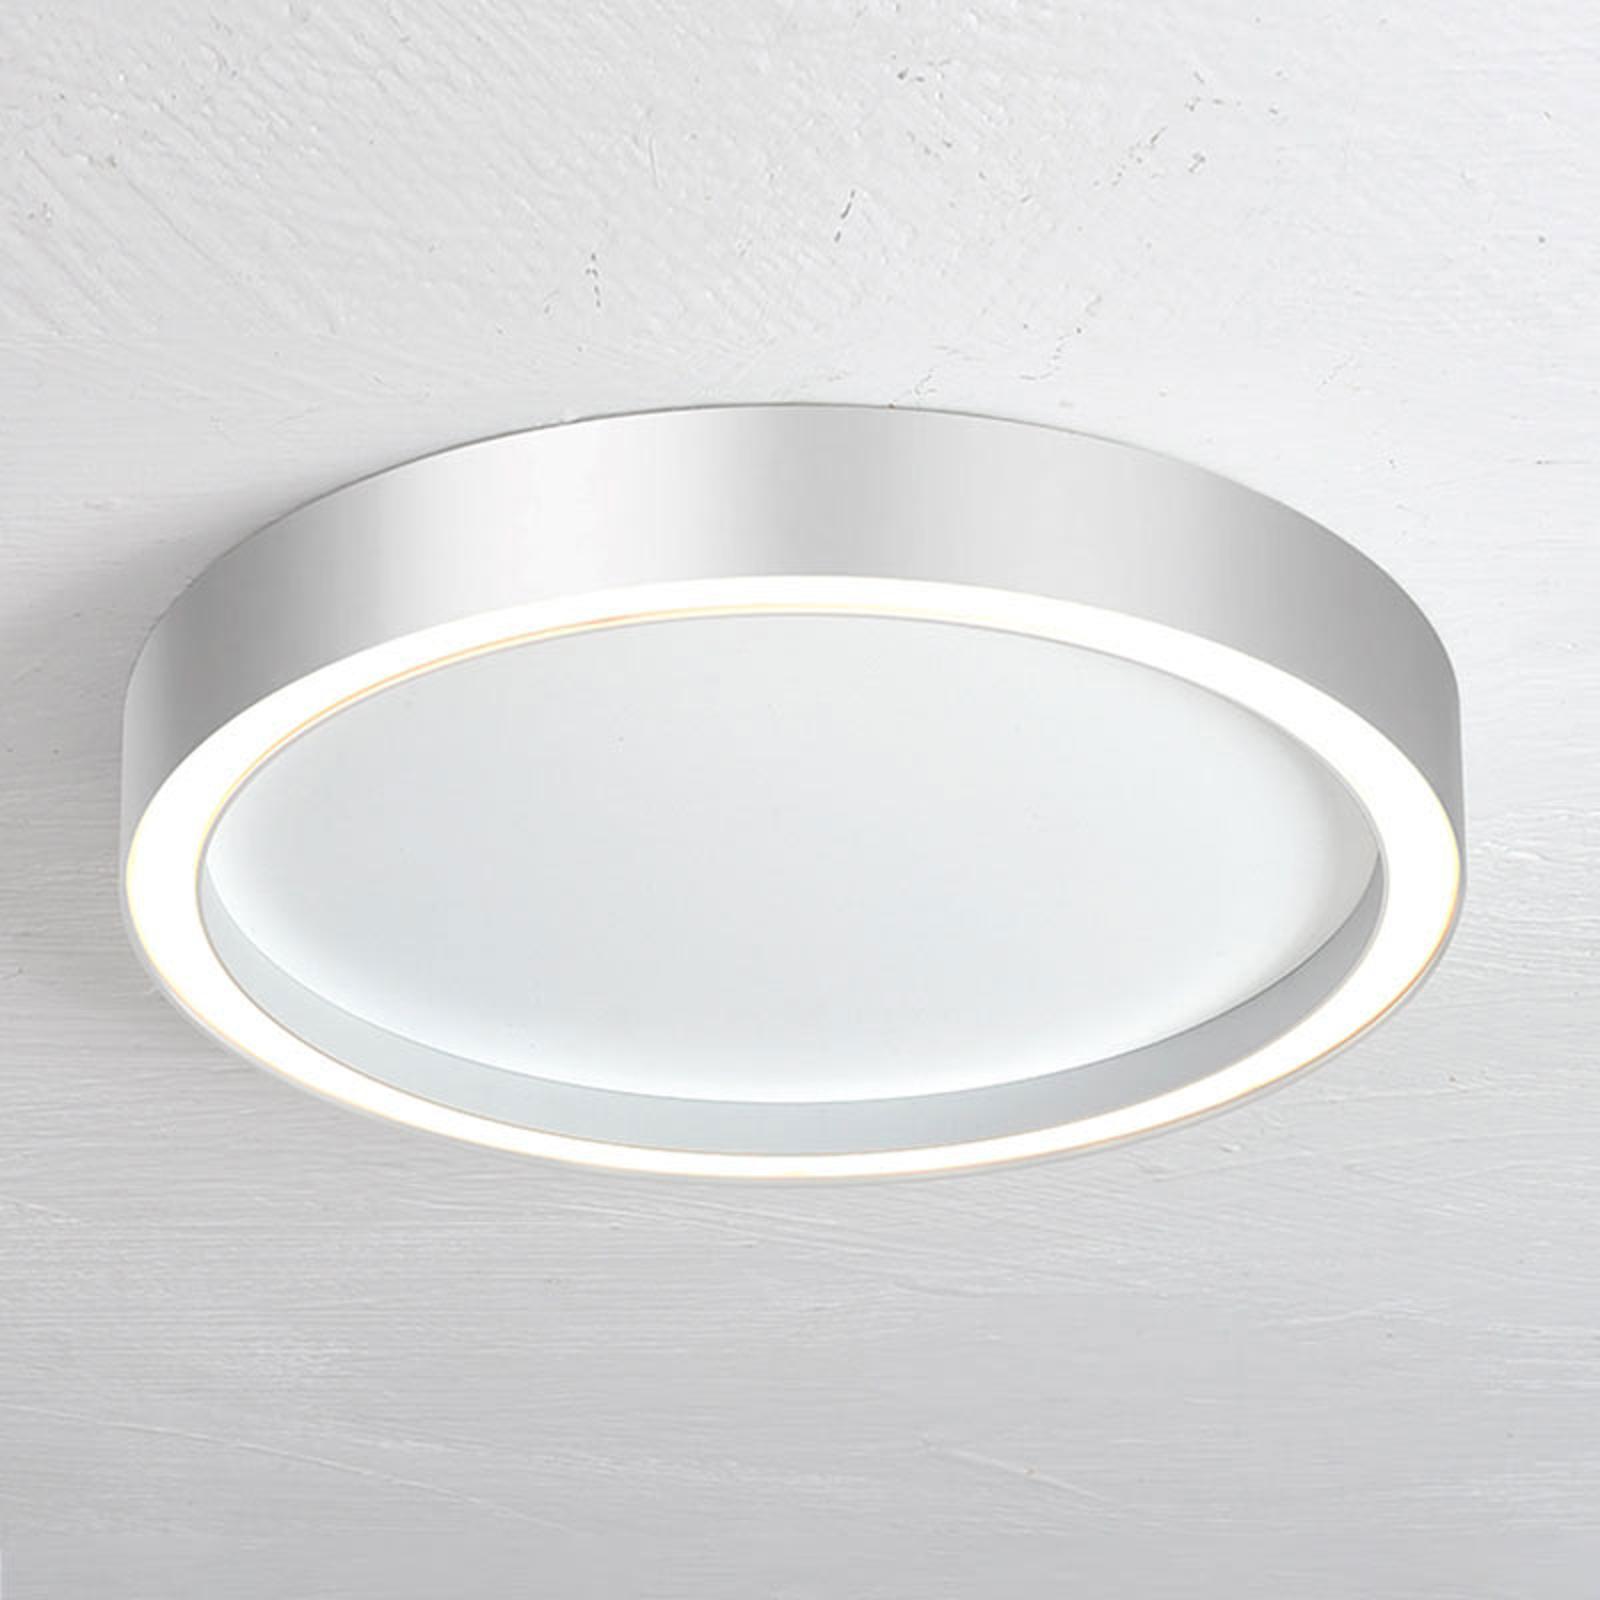 Bopp Aura LED plafondlamp Ø 40cm wit/aluminium